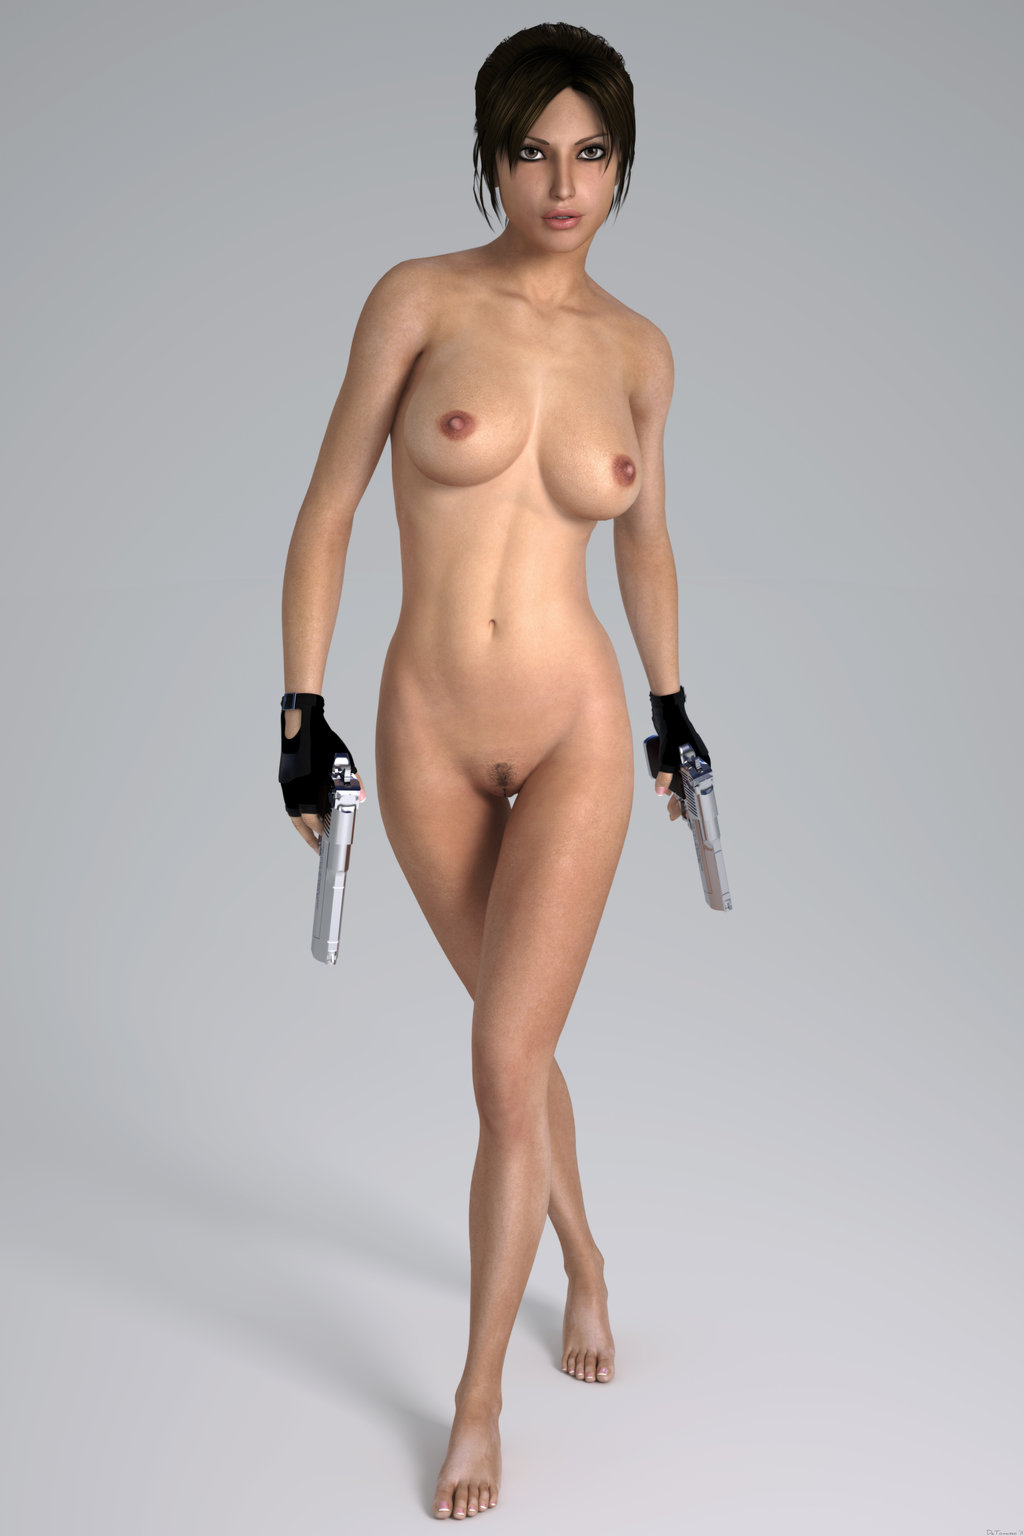 Lara croft porno film